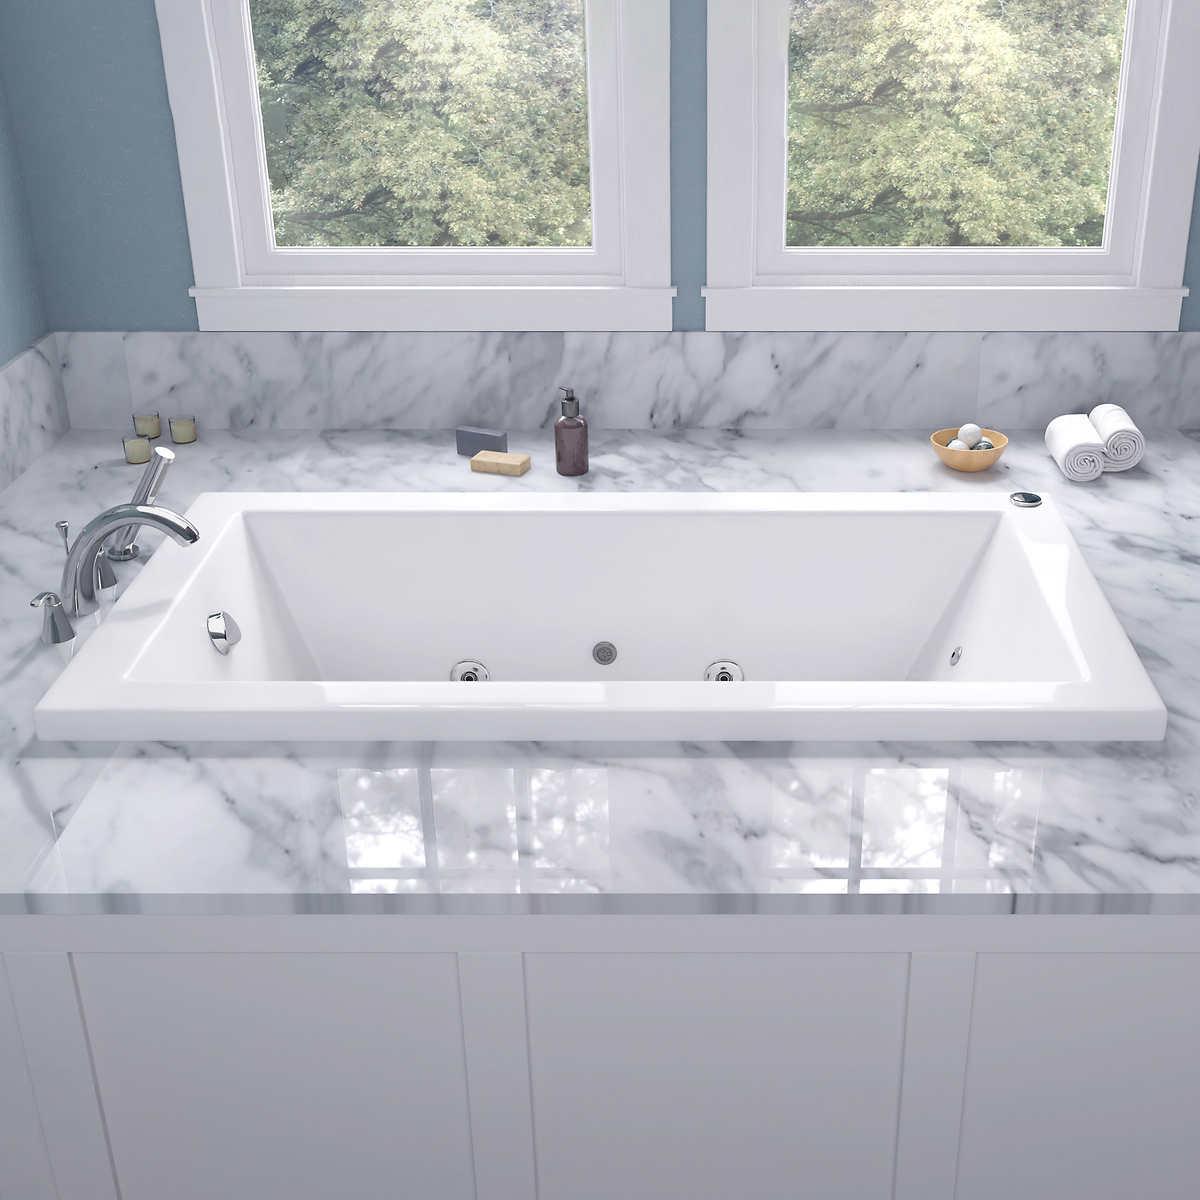 Access Tubs Venetian Dual System Bathtub Whirlpool Air Massage Therapy